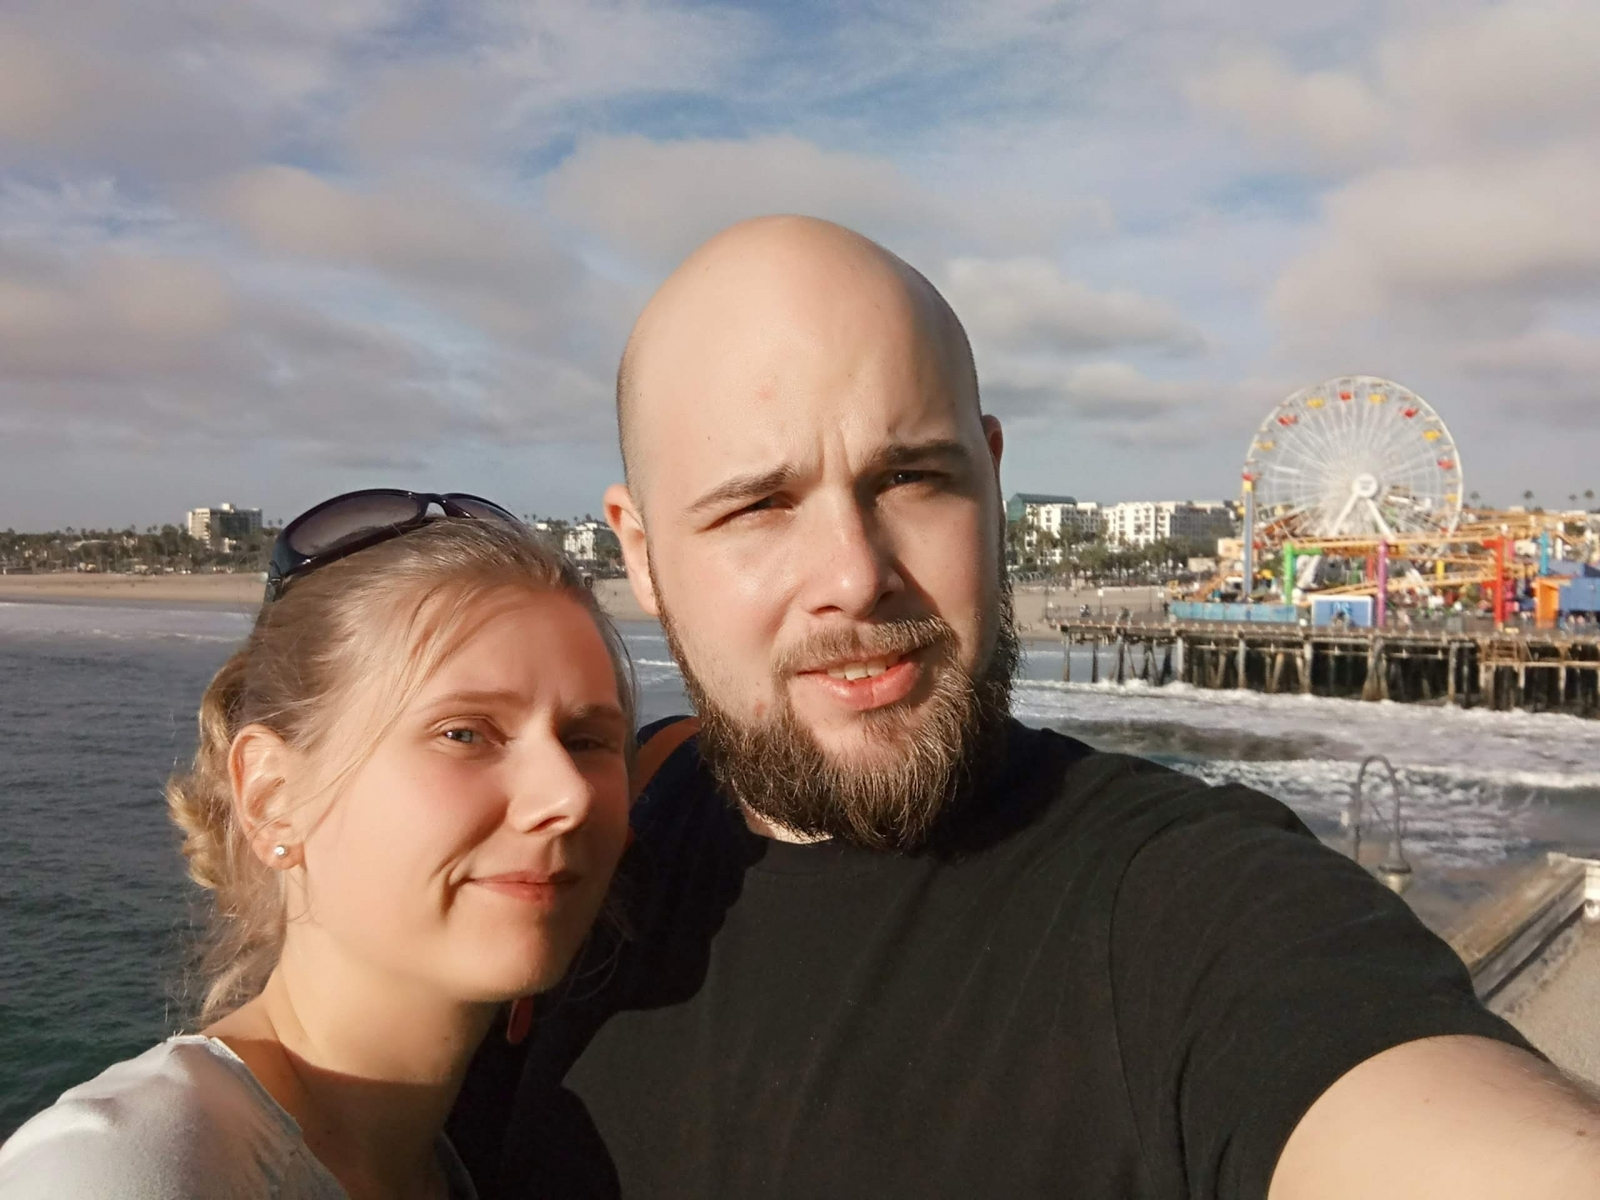 Мы на побережье Санта-Моники